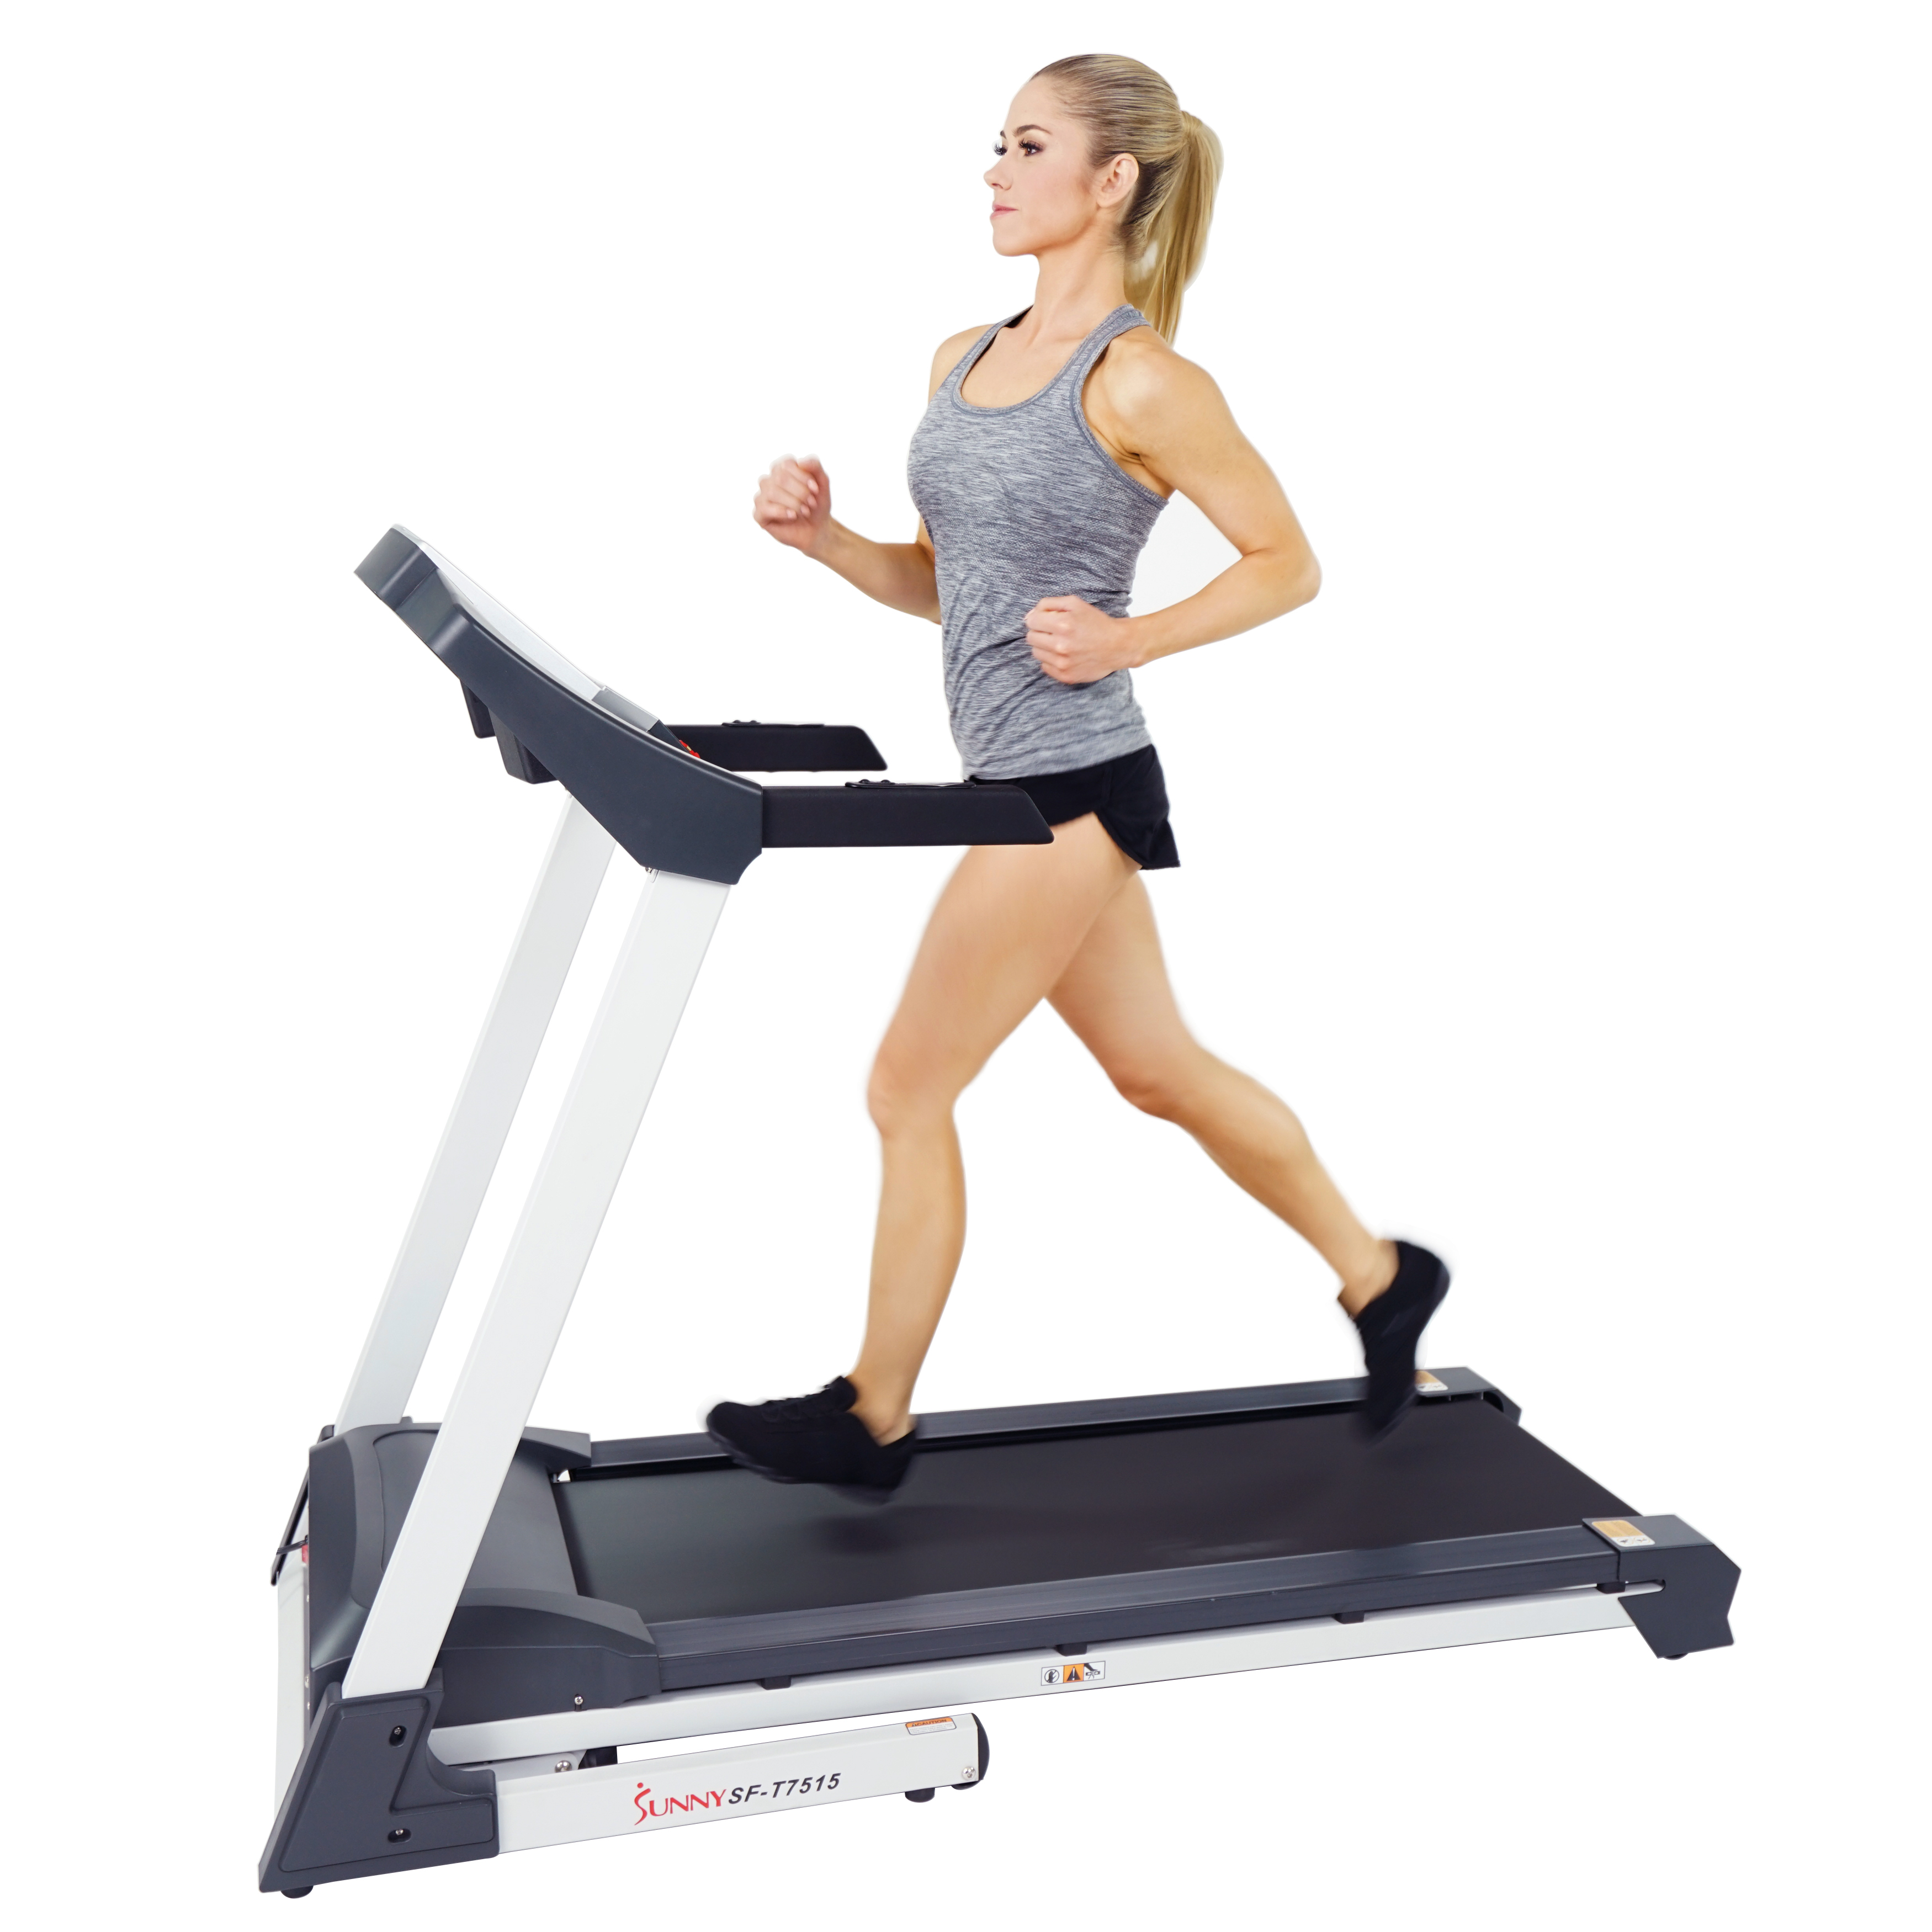 Sunny Health & Fitness SF-T7515 Smart Treadmill w Bluetooth, Phone by Sunny Health & Fitness